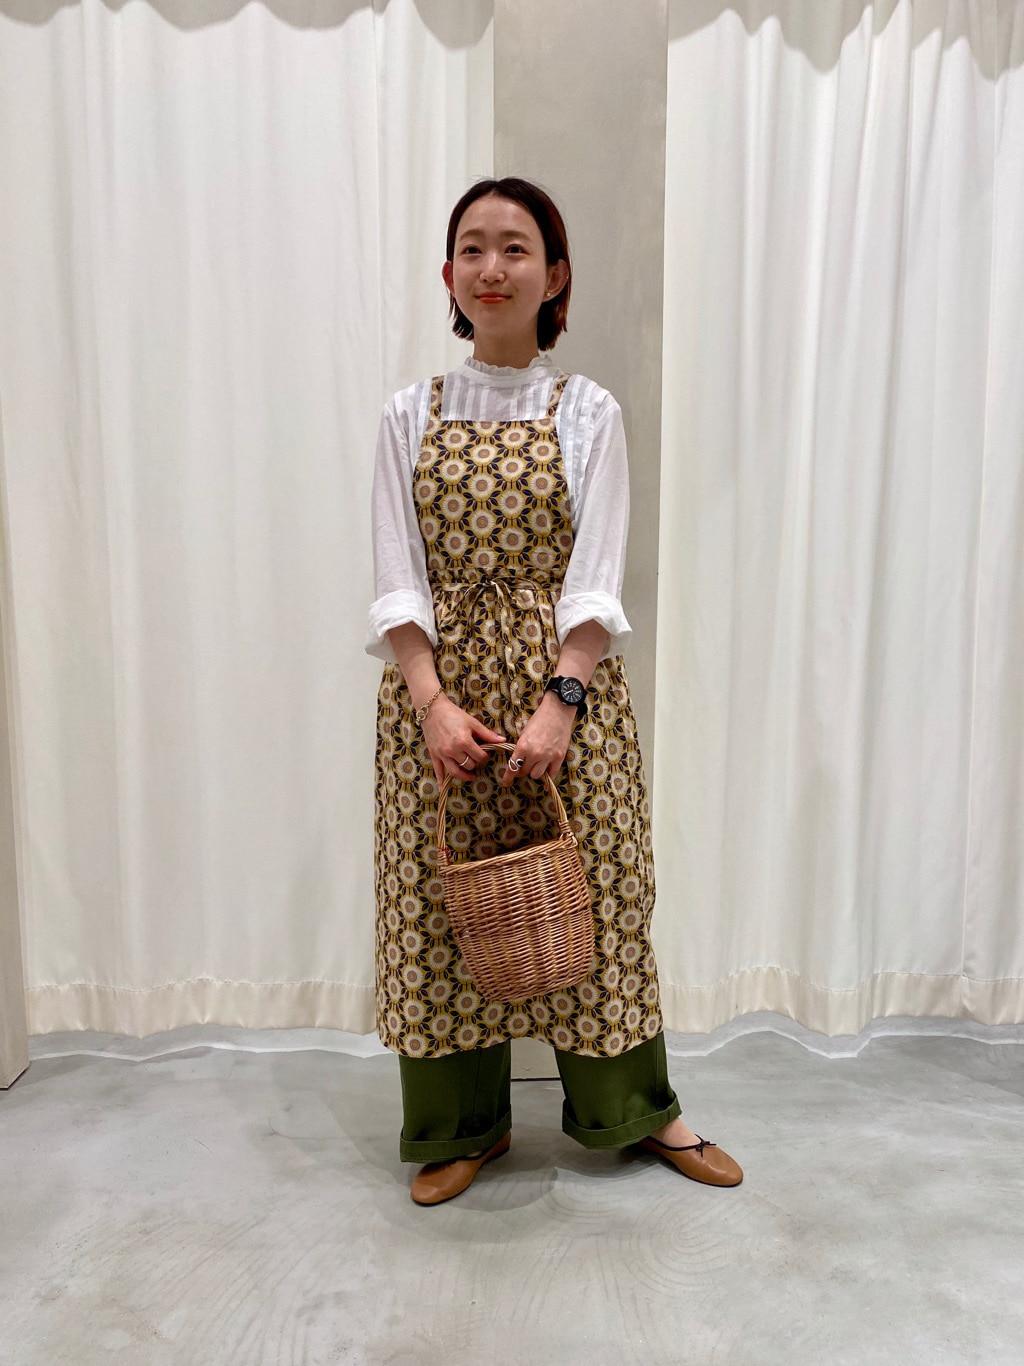 - CHILD WOMAN CHILD WOMAN , PAR ICI 東京スカイツリータウン・ソラマチ 身長:150cm 2020.08.22